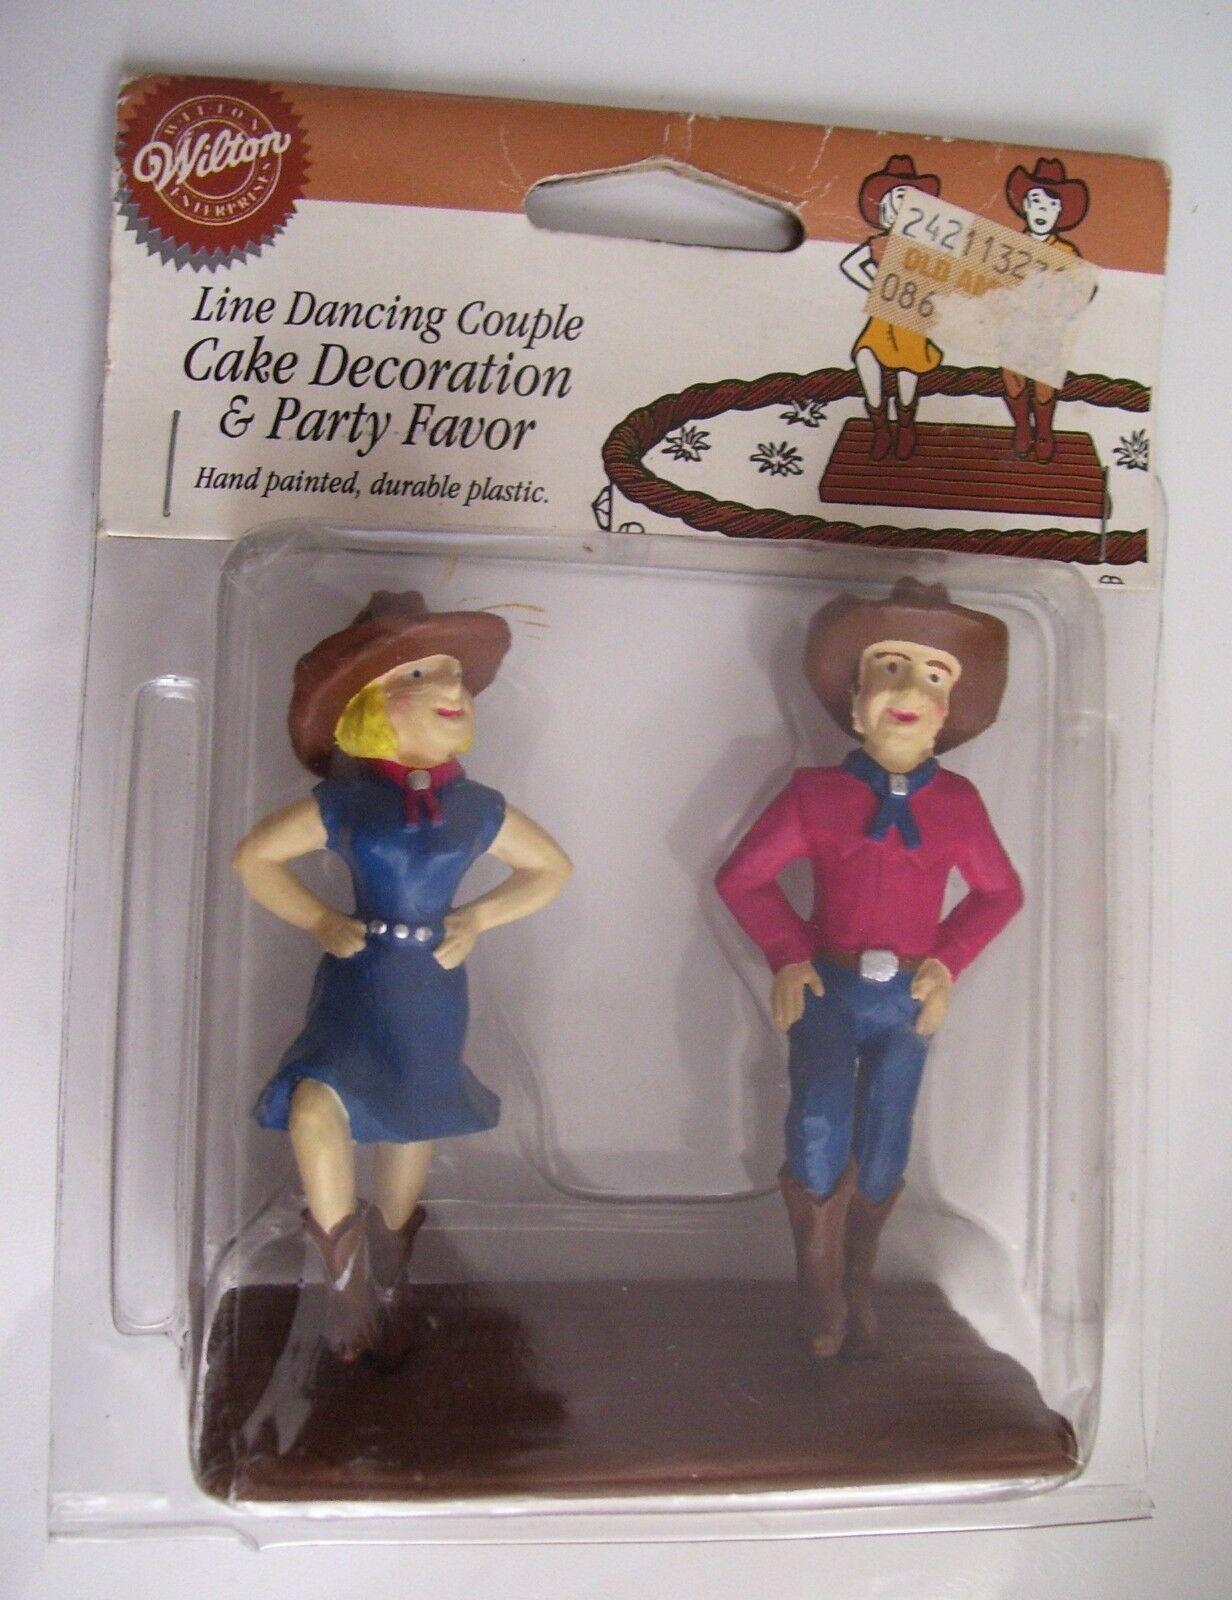 RARE Wilton Cake Topper Pays Western thème Line Dancing Couple COW-BOYS 1995